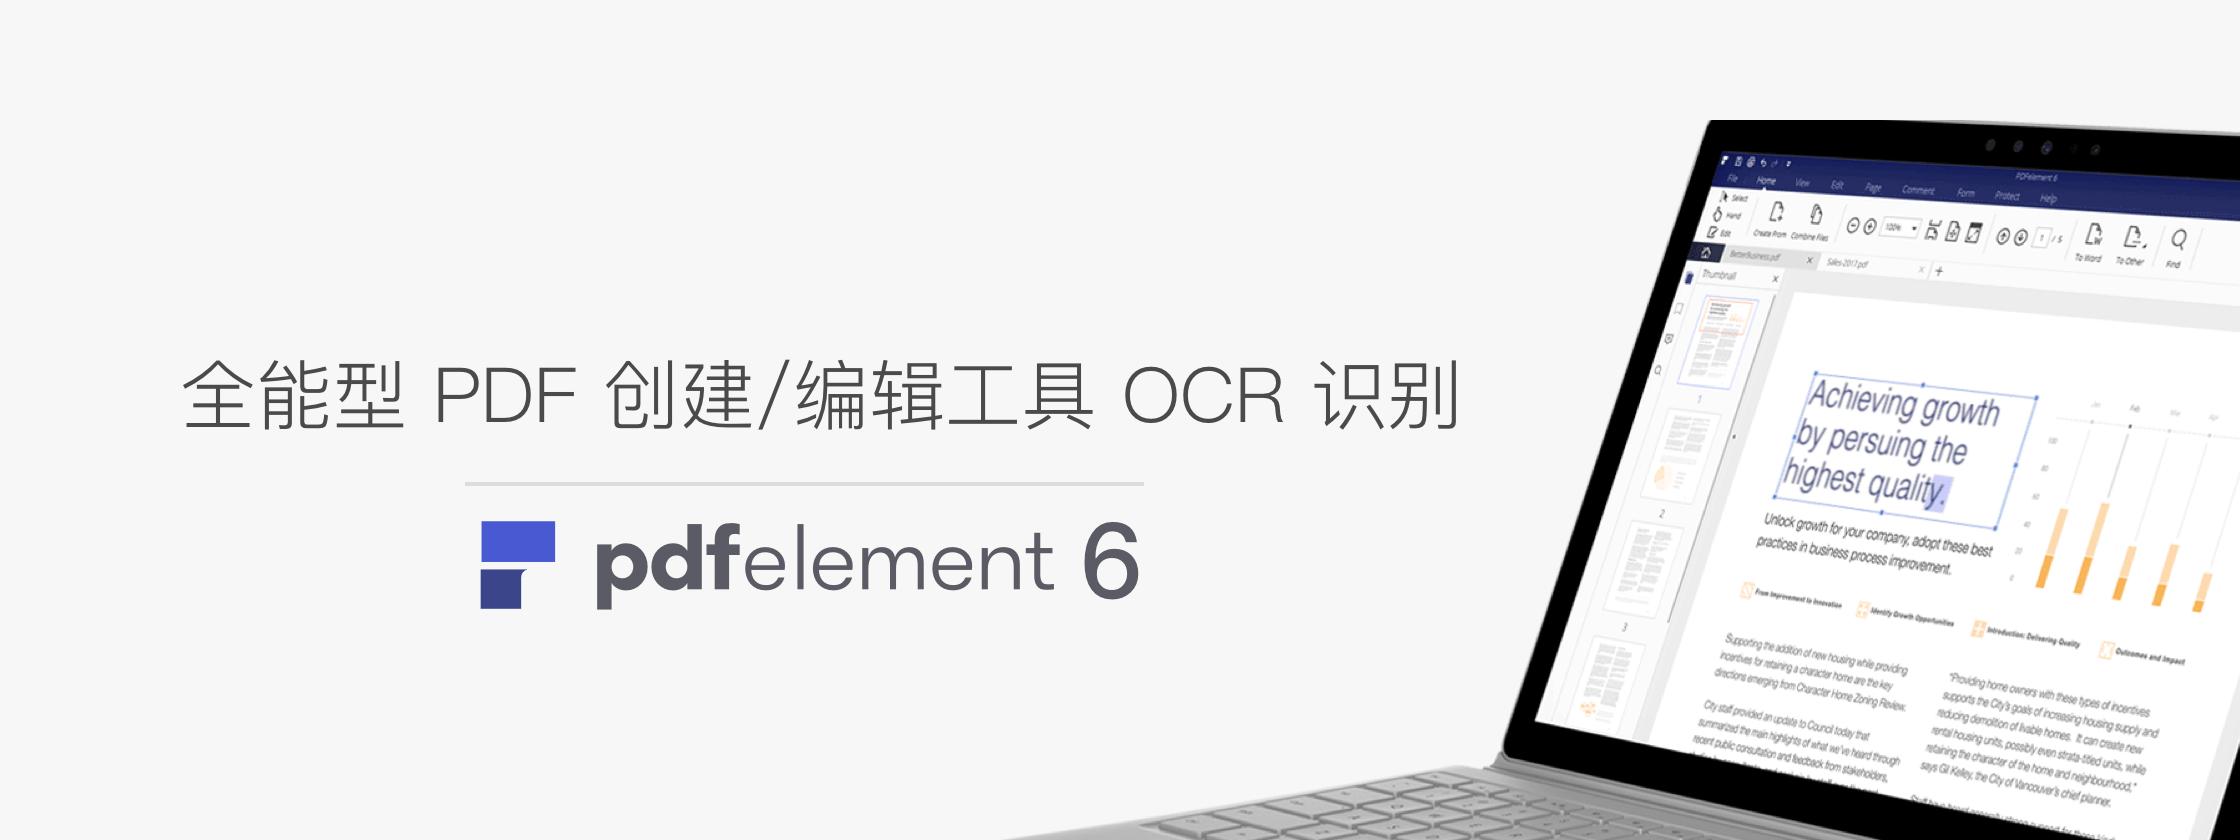 PDFelement 6 – 全能型 PDF 创建/编辑工具 OCR 识别